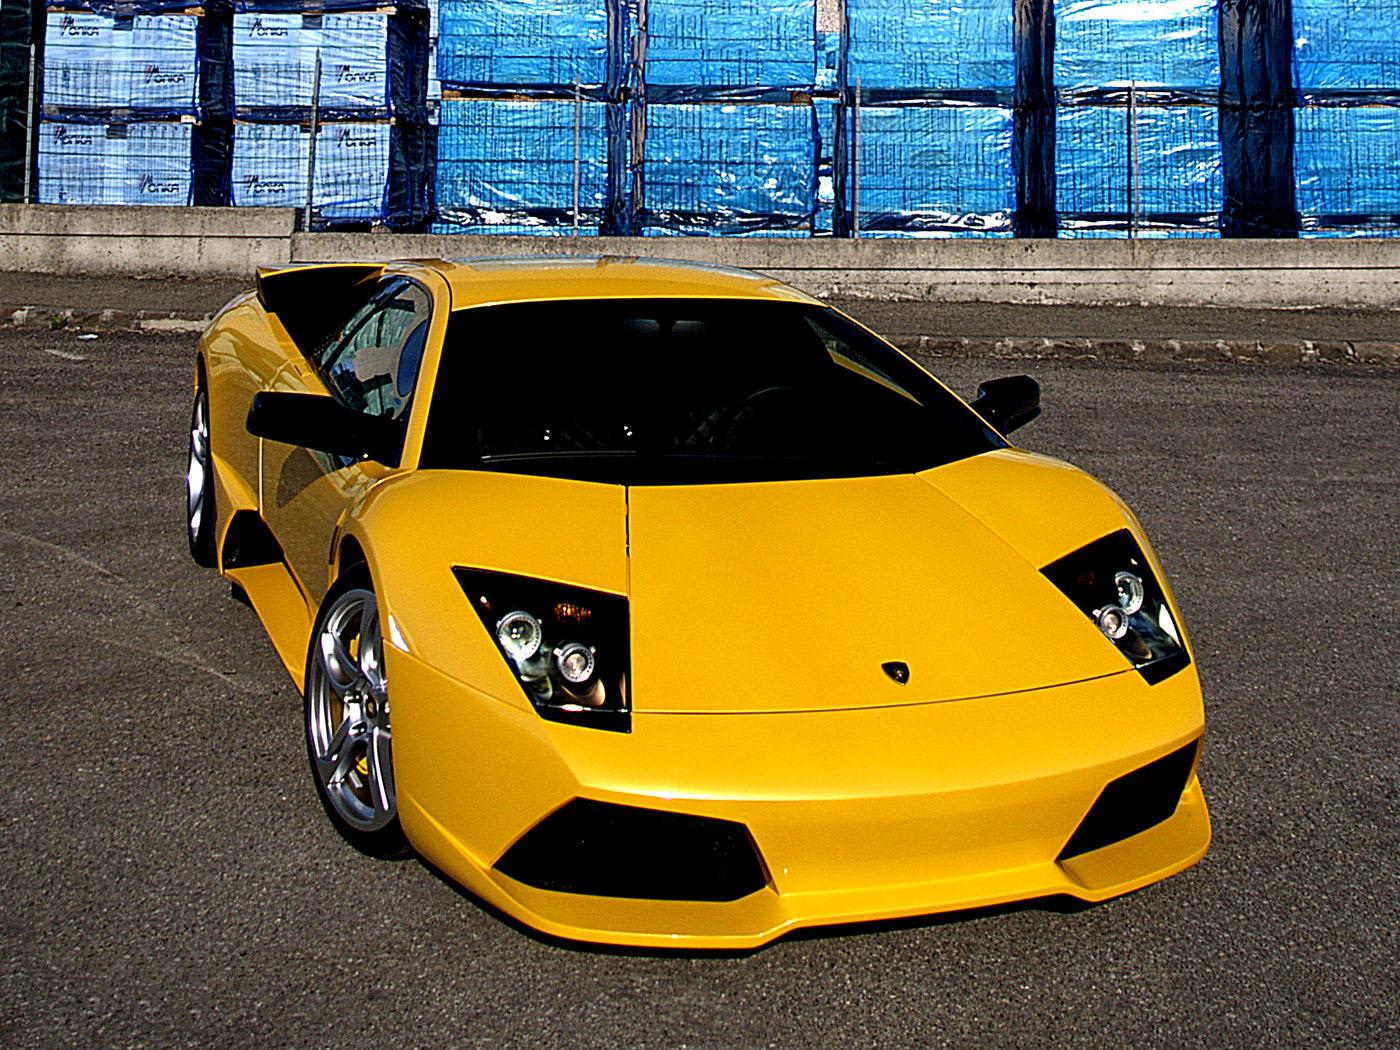 Lamborghini Murcielago LP640 photos - PhotoGallery with 36 pics ...